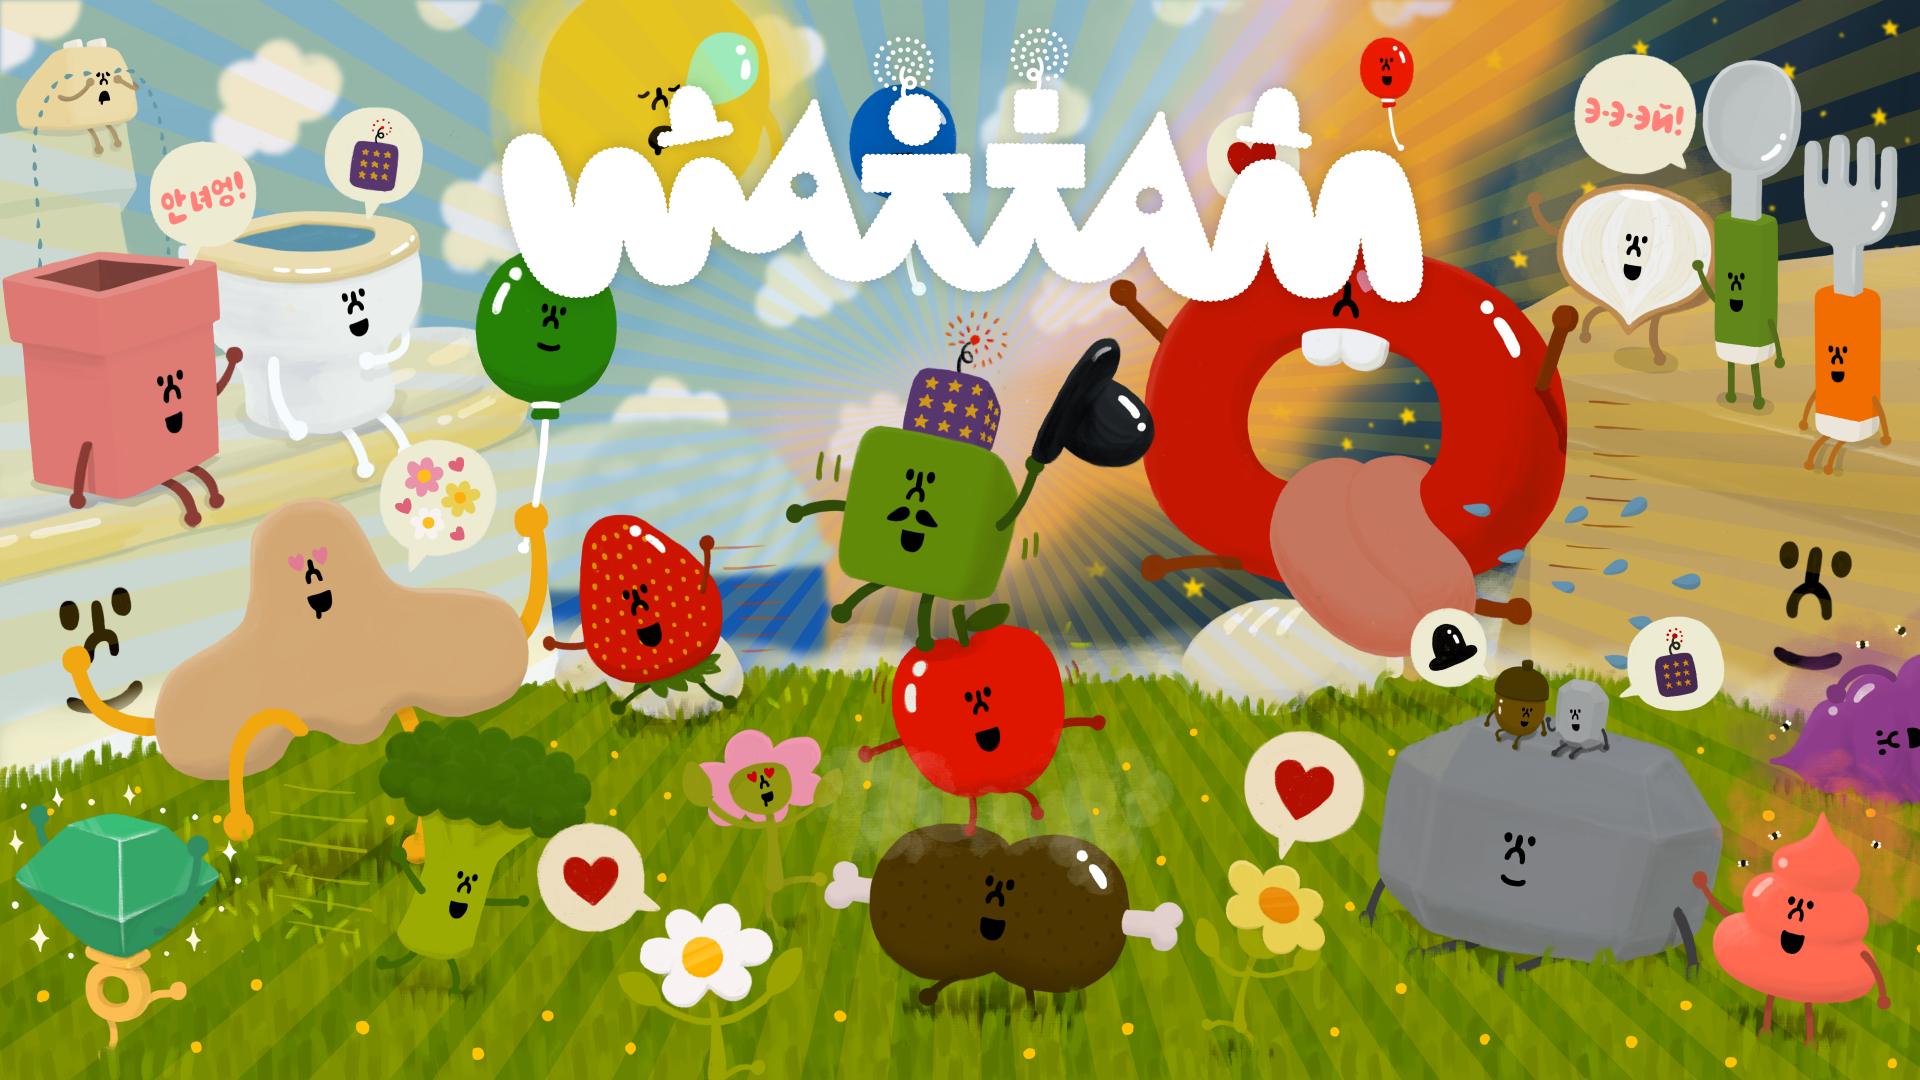 Wattam (ワッタン)